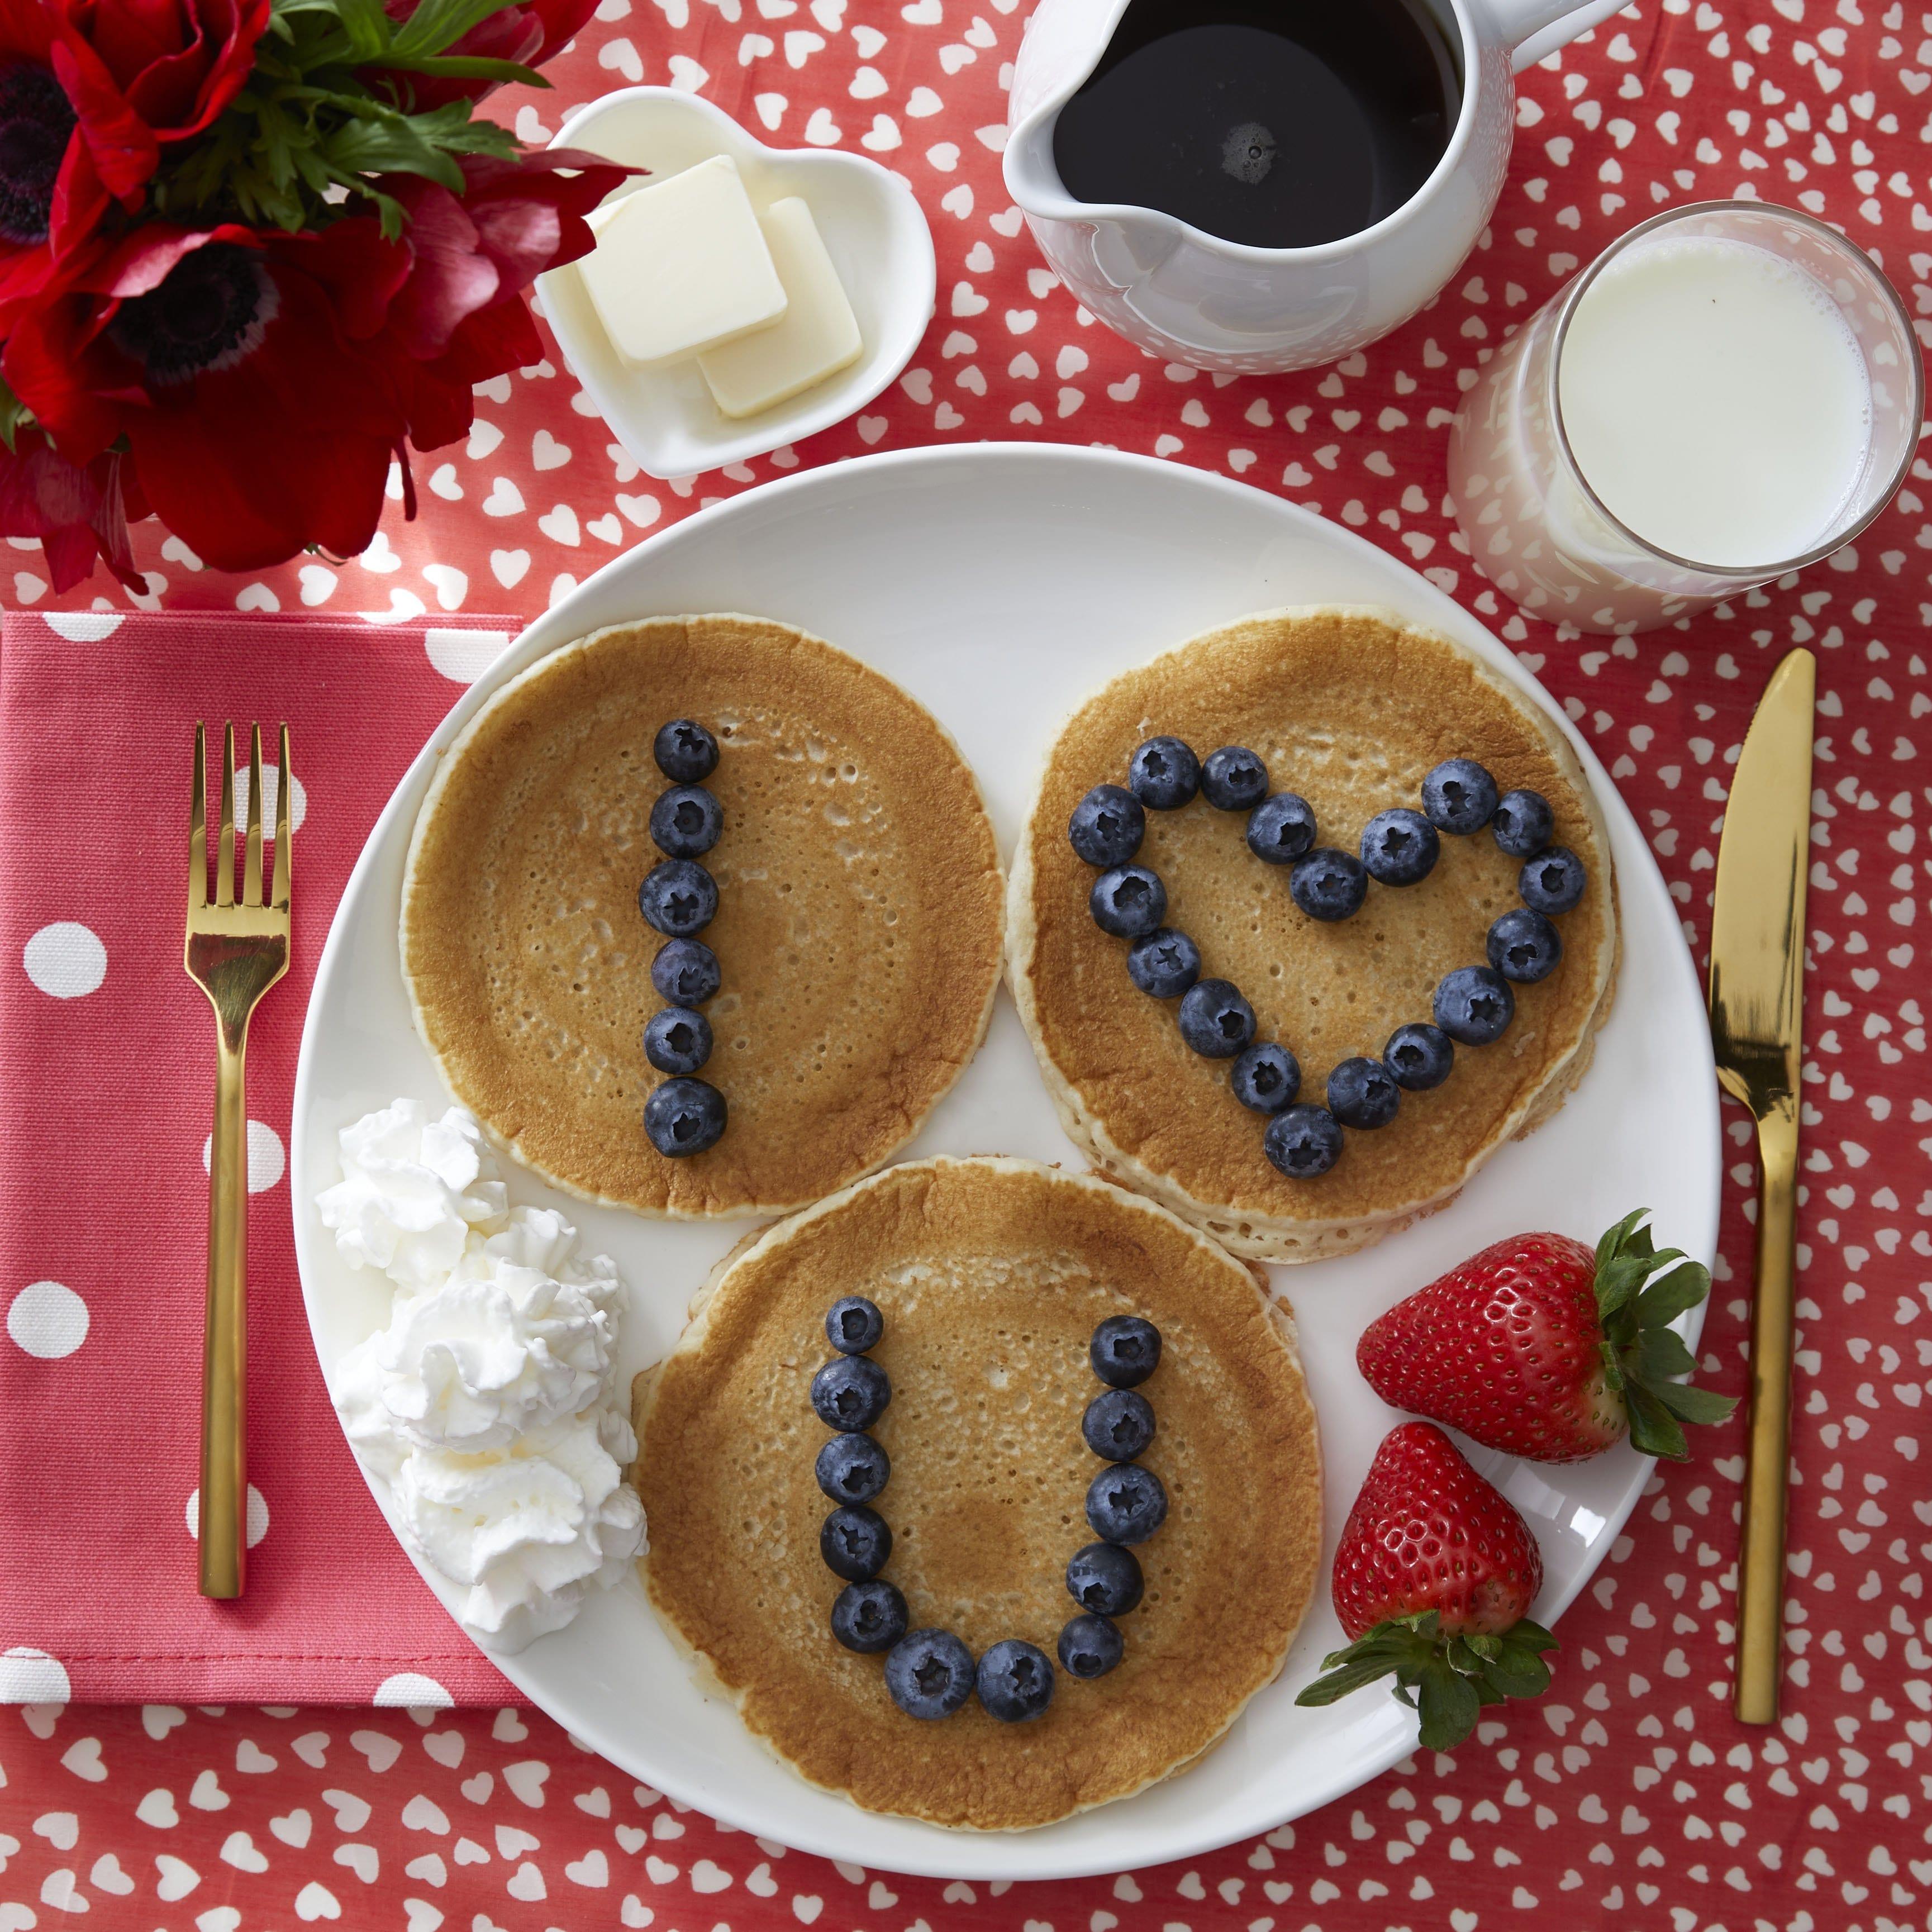 Darcy Miller Designs, Valentine Breakfast, Valentines, breakfast, I heart you, love note, pancakes, berries, blueberries, sweet breakfast, breakfast table, easy snack, Darcy Miller, DIY